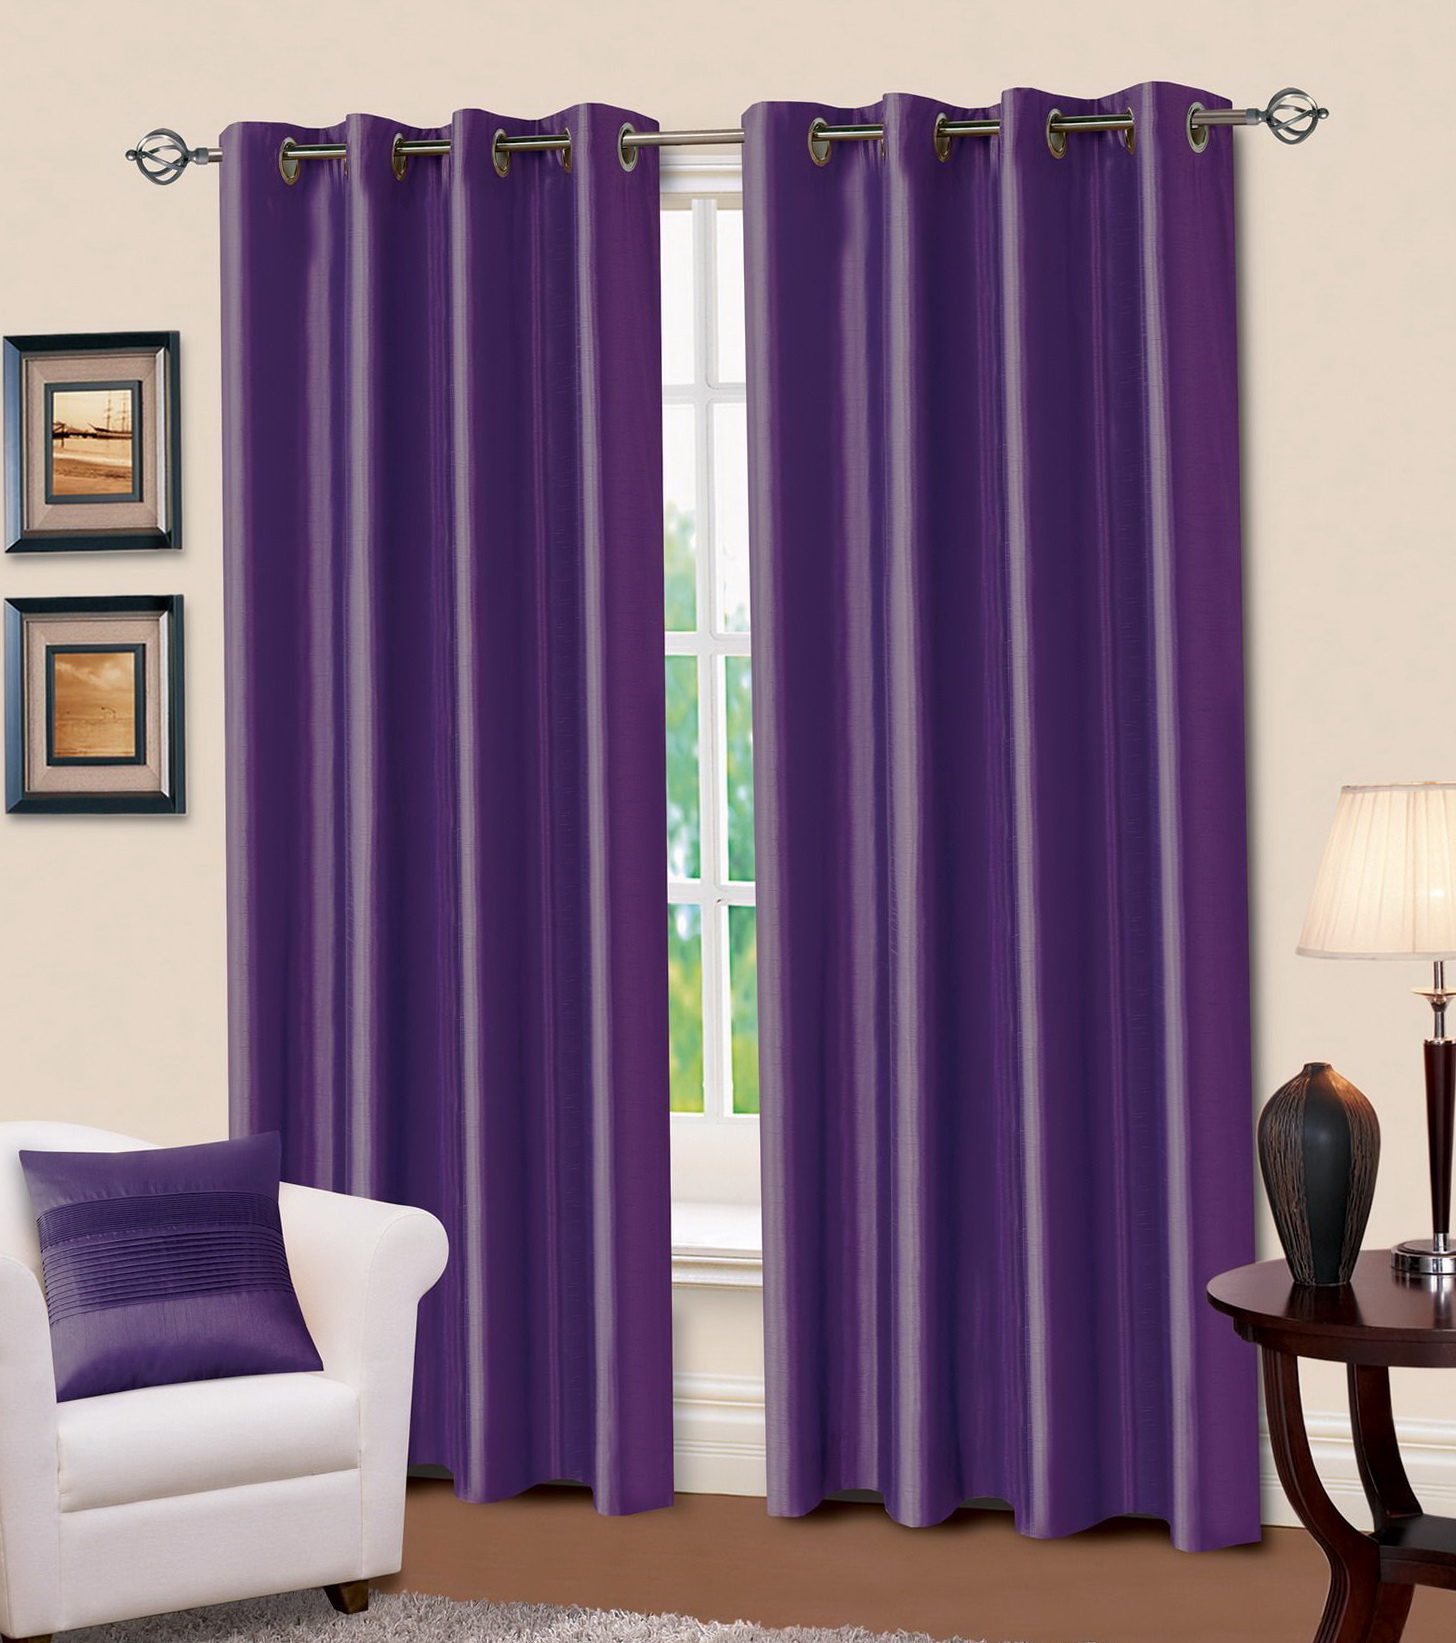 Faux Suede Curtains 90 X 90